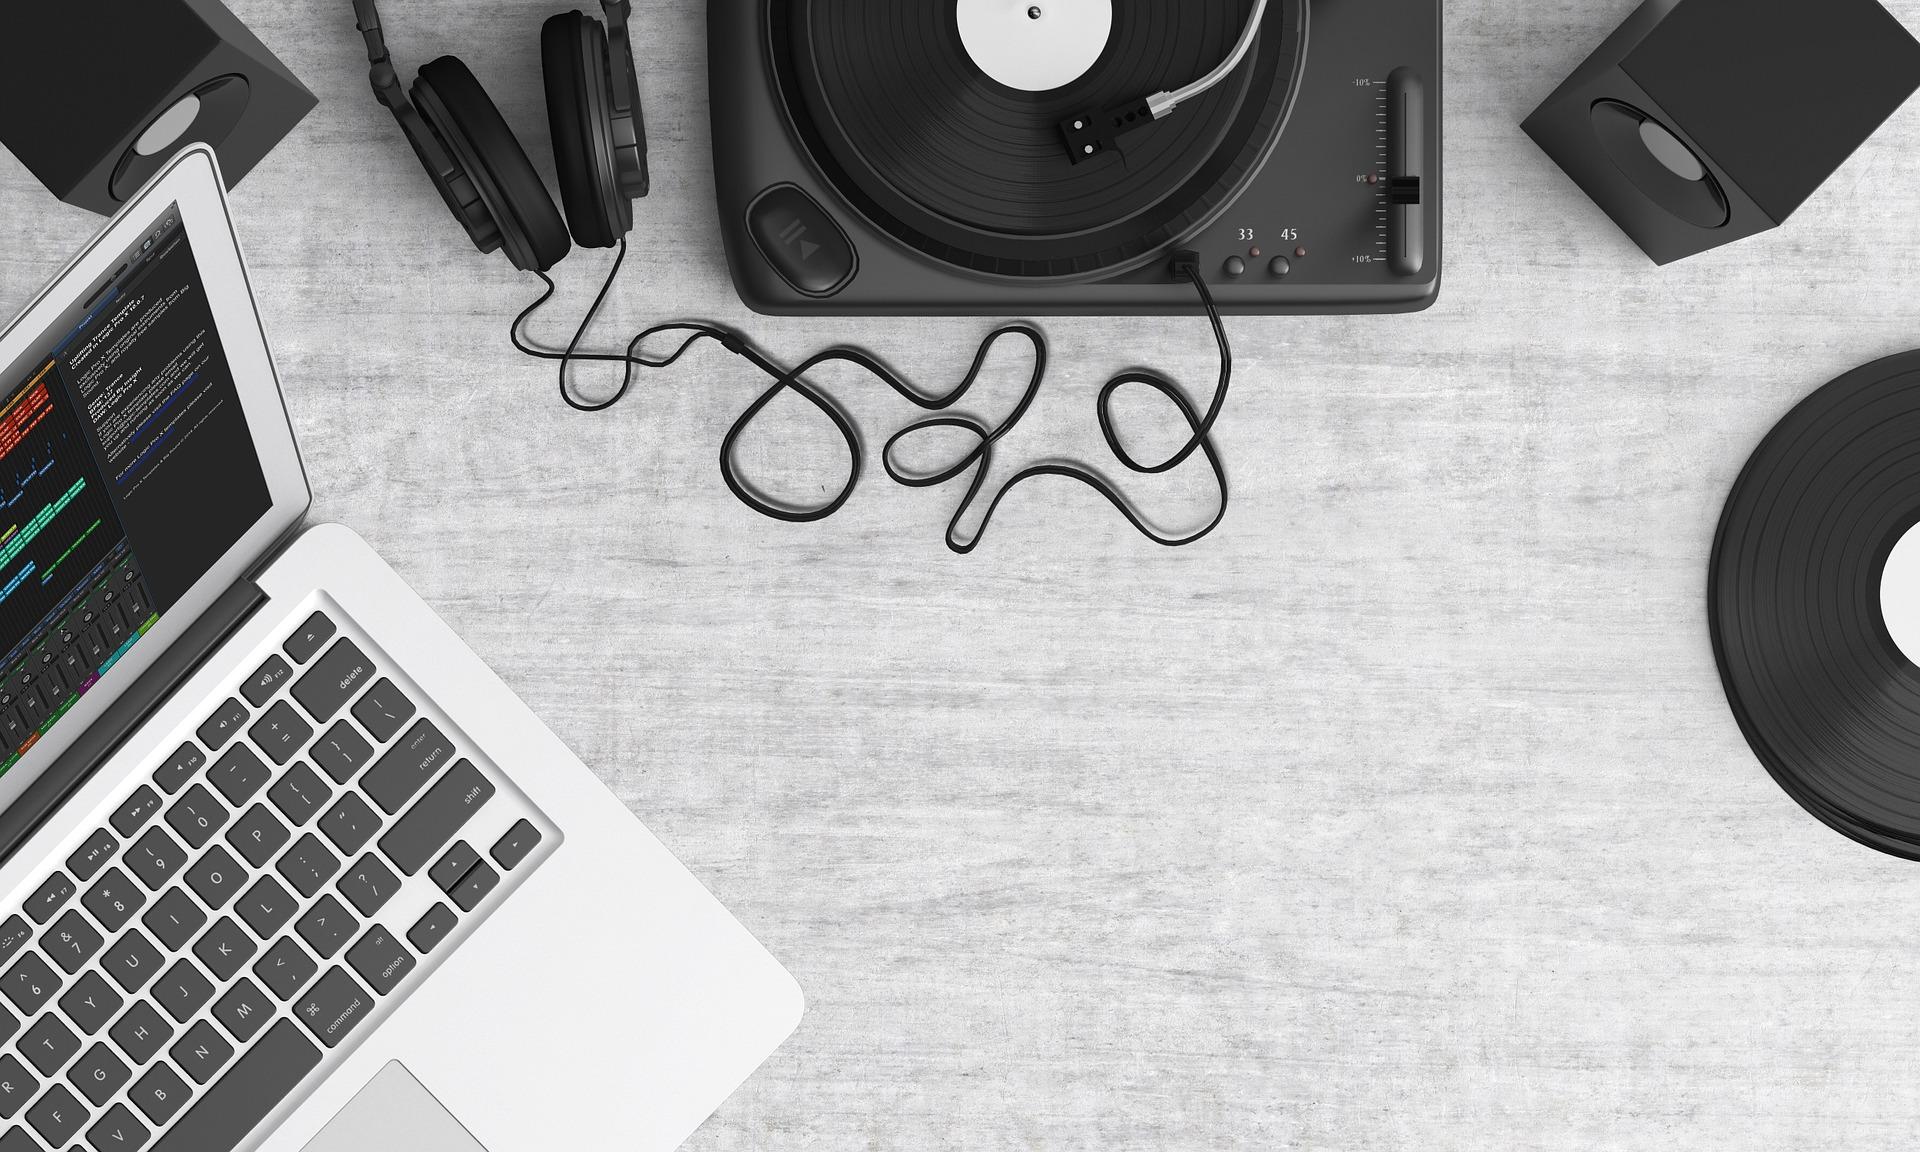 Chromecast Audio - Una herramienta para escuchar música en streaming